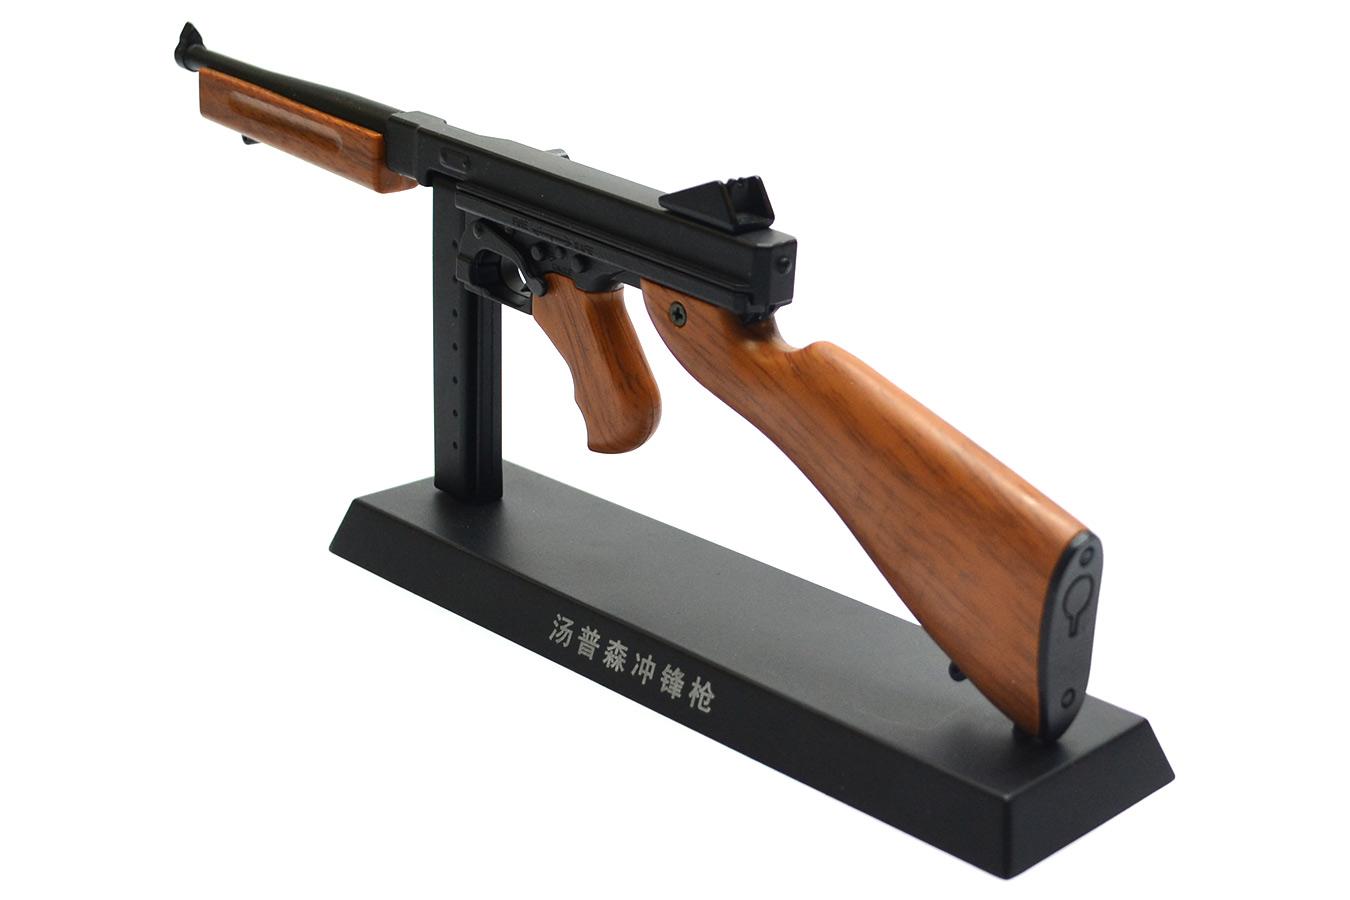 Пистолет-пулемёт Томпсона изображение 3